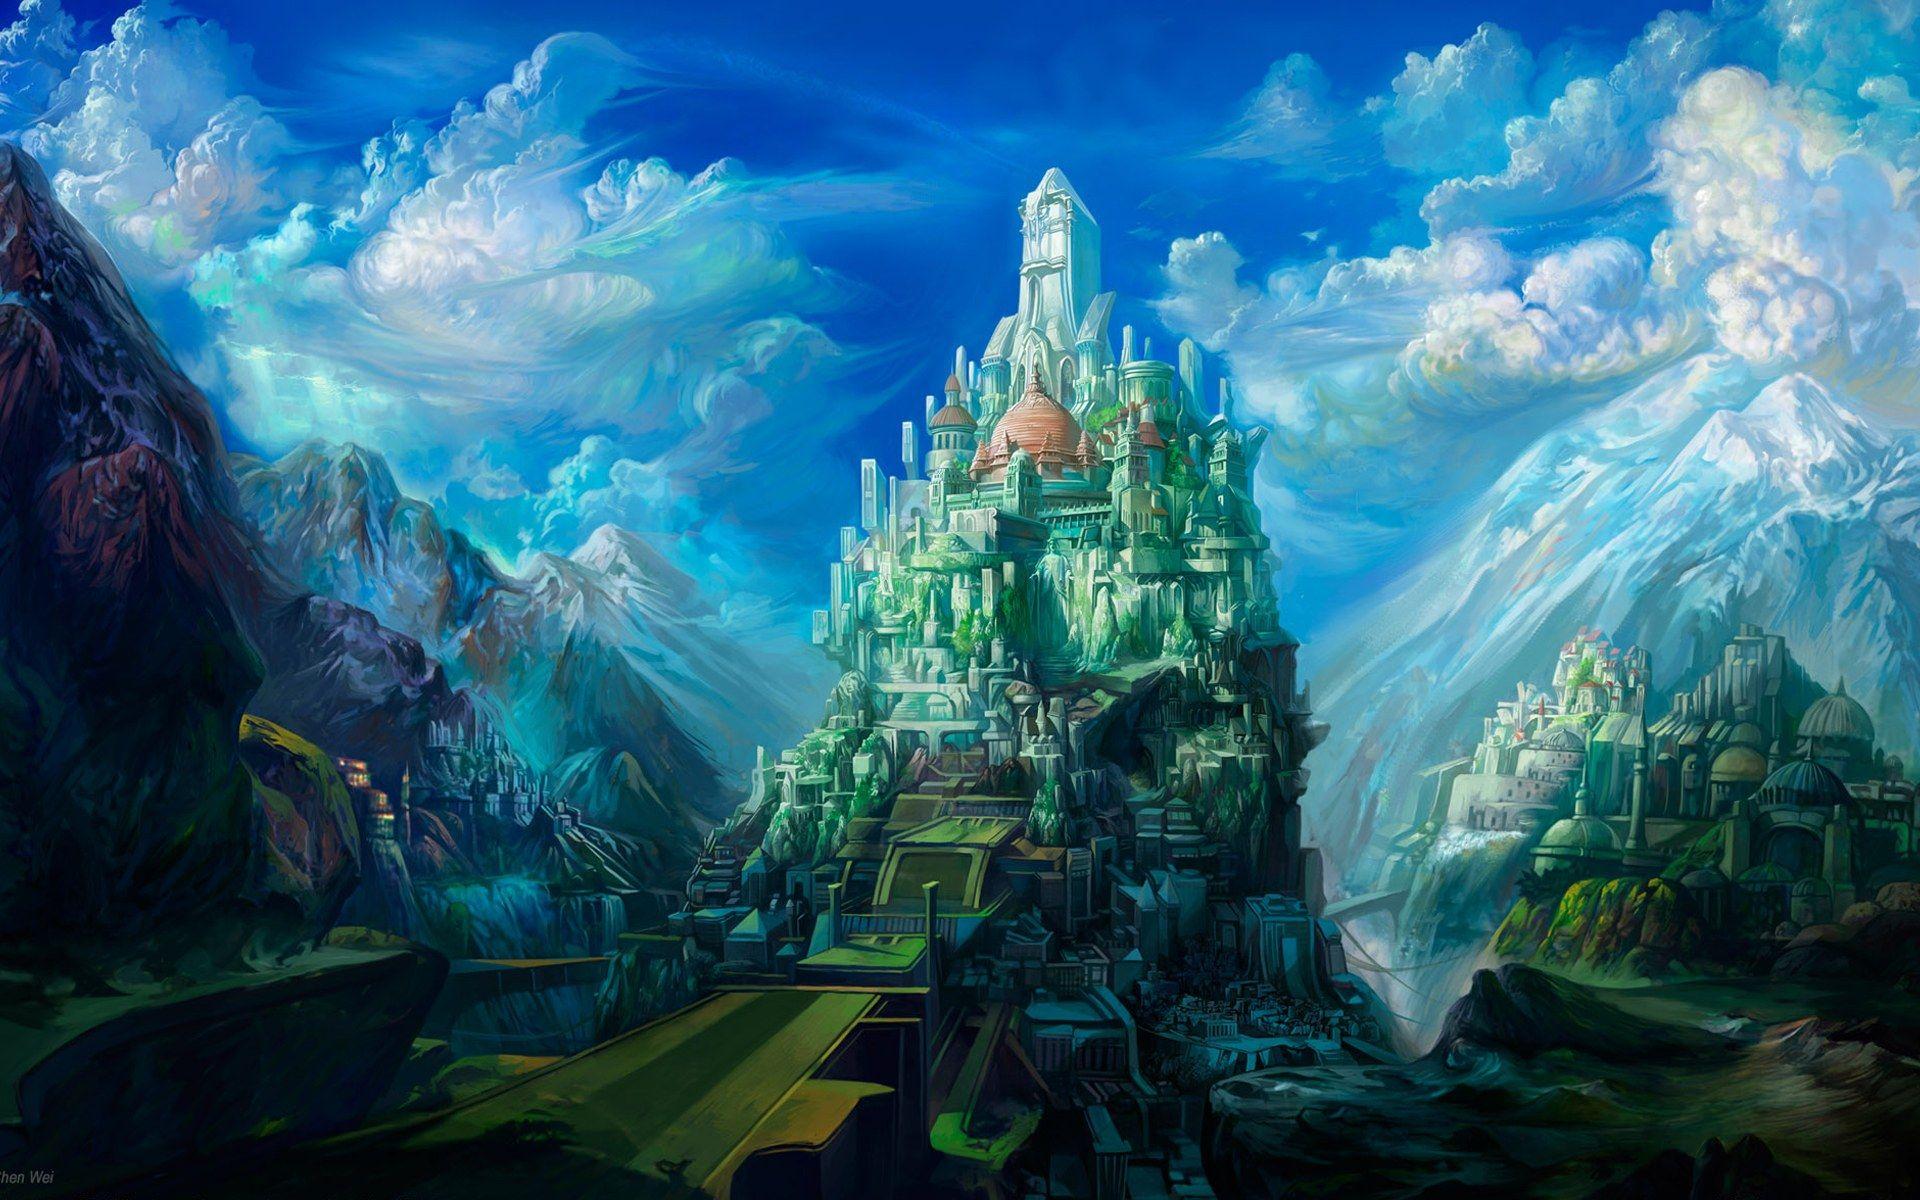 images+of+art | art, background, breathtaking, fantasy, scenery